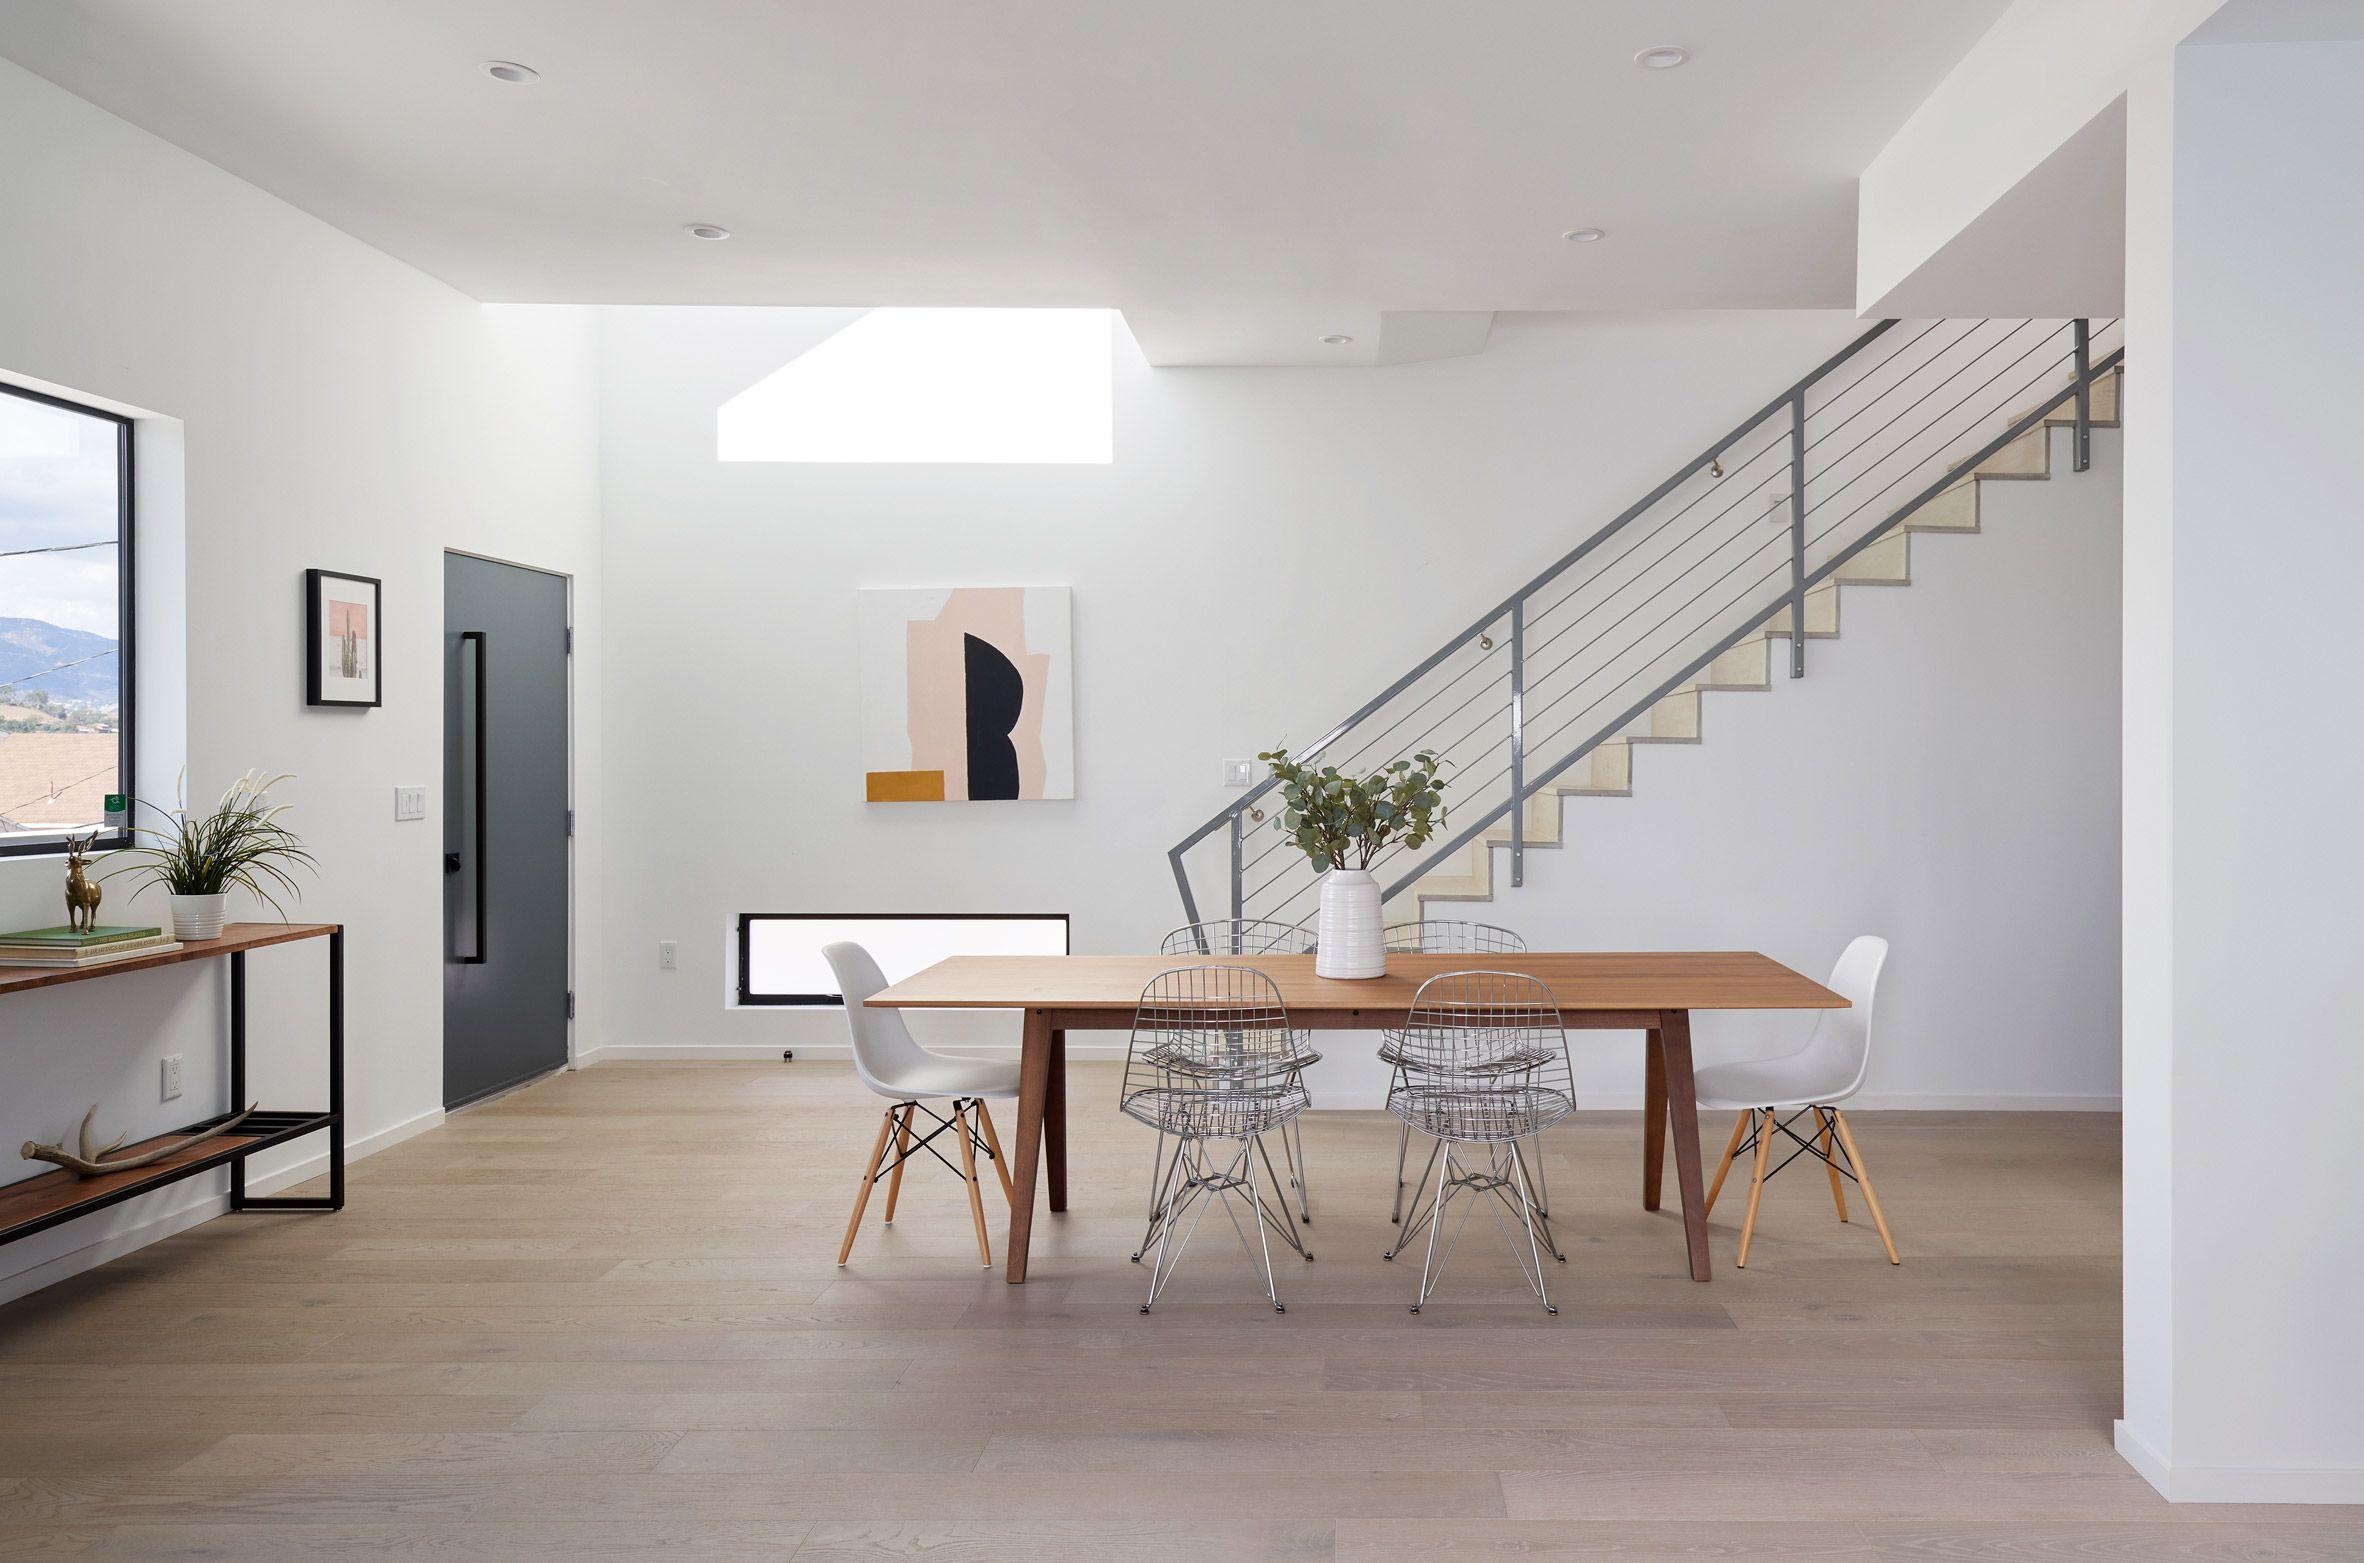 Kleines badezimmer design 5 'x 6'  east baltimore street by urban operations  interiors in